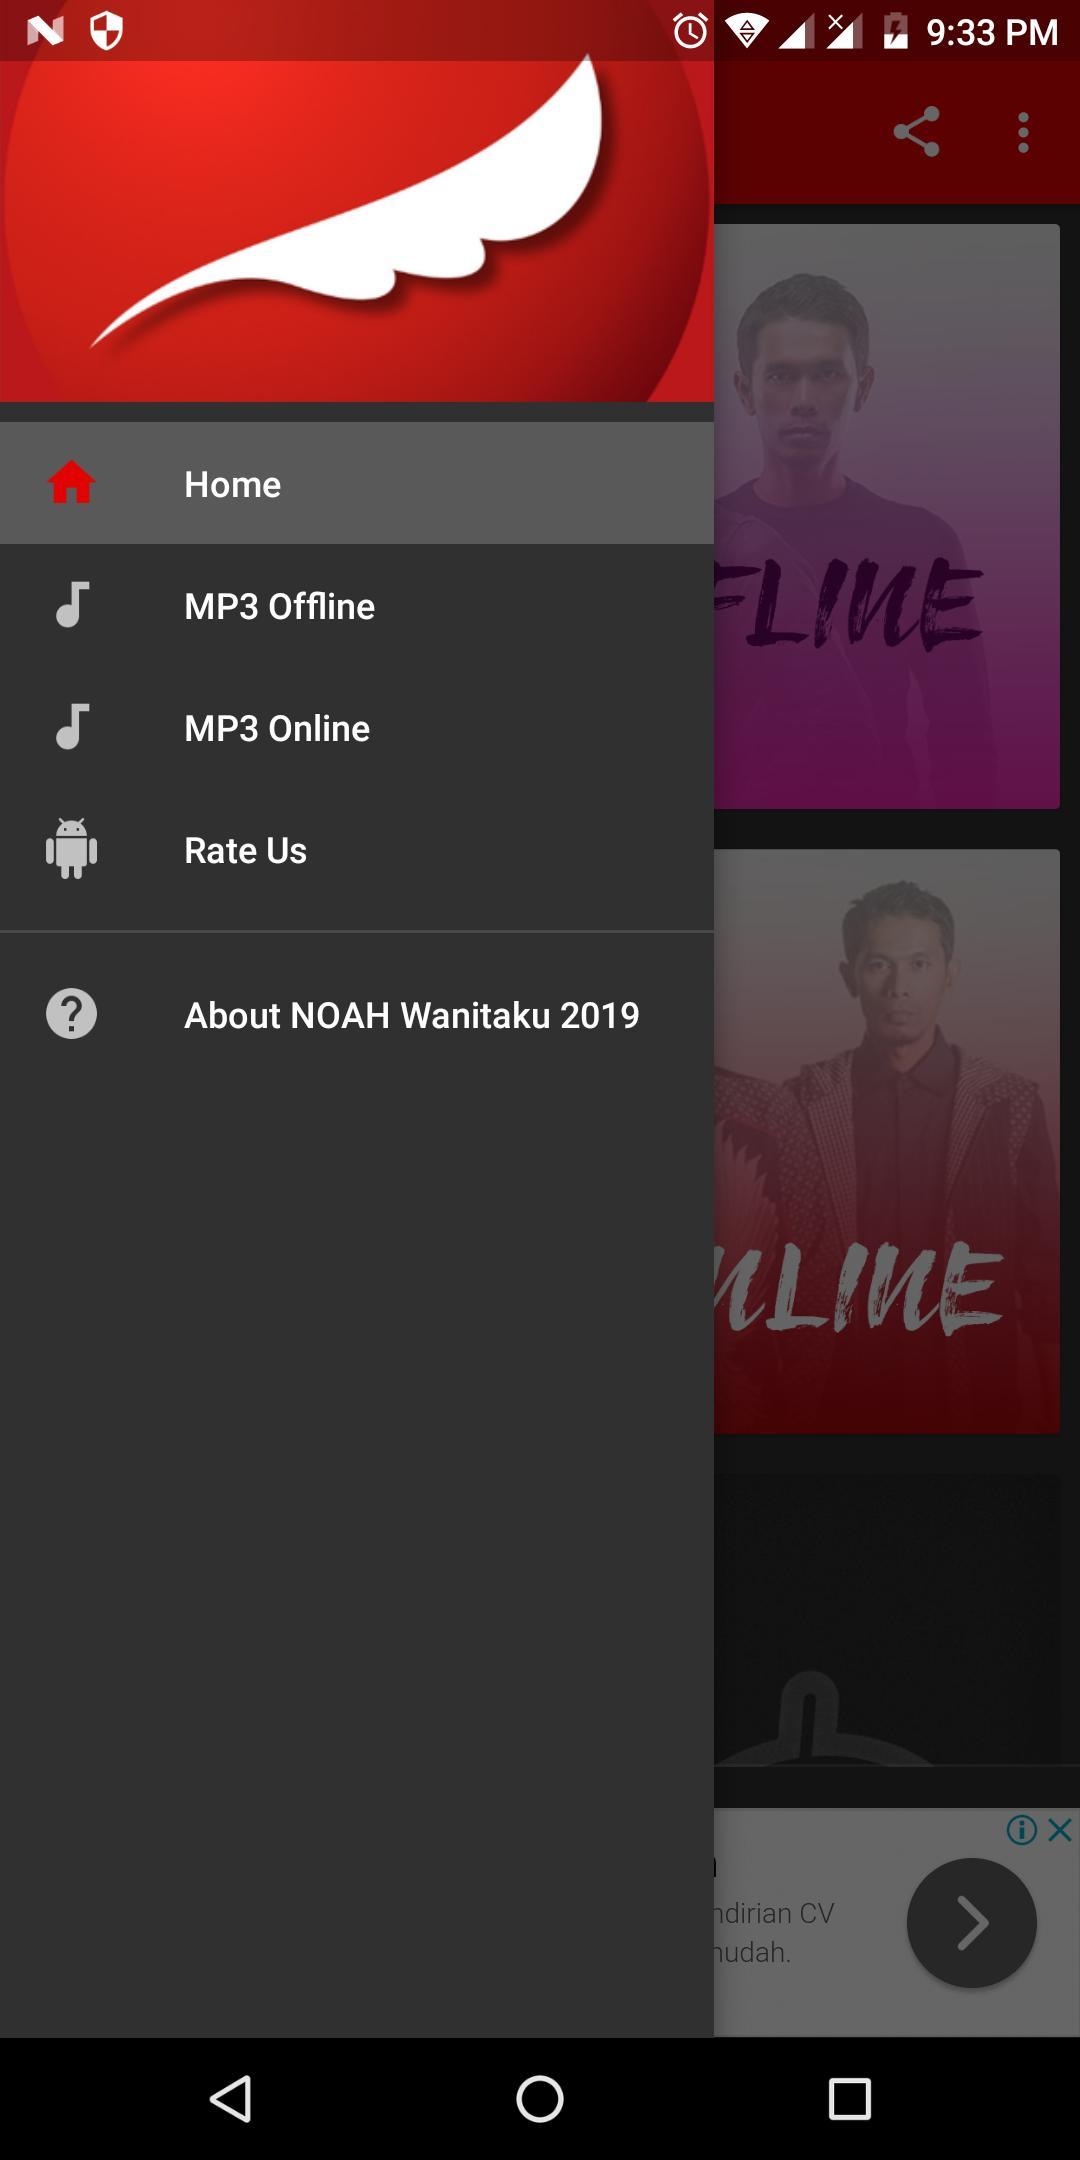 Noah Wanitaku 2019 For Android Apk Download